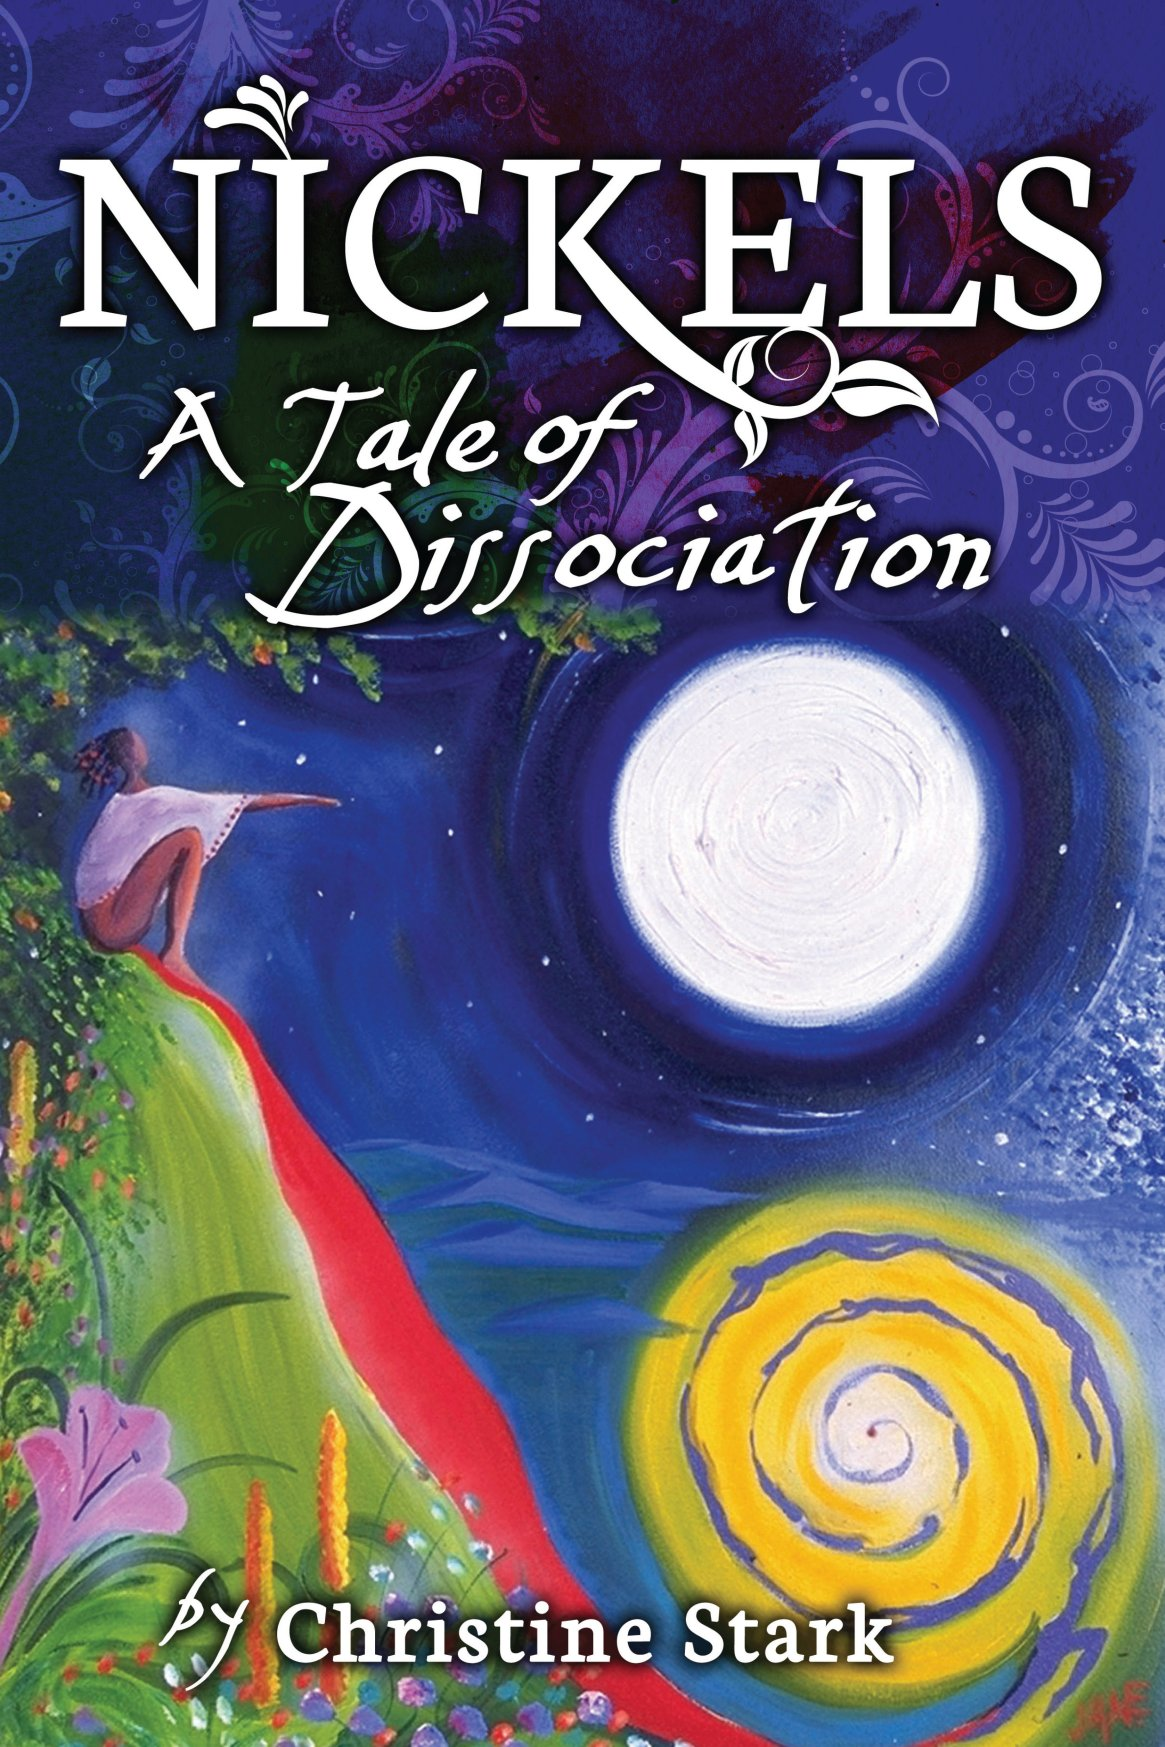 Nickels: A tale of dissociation 978-1-61599-050-4